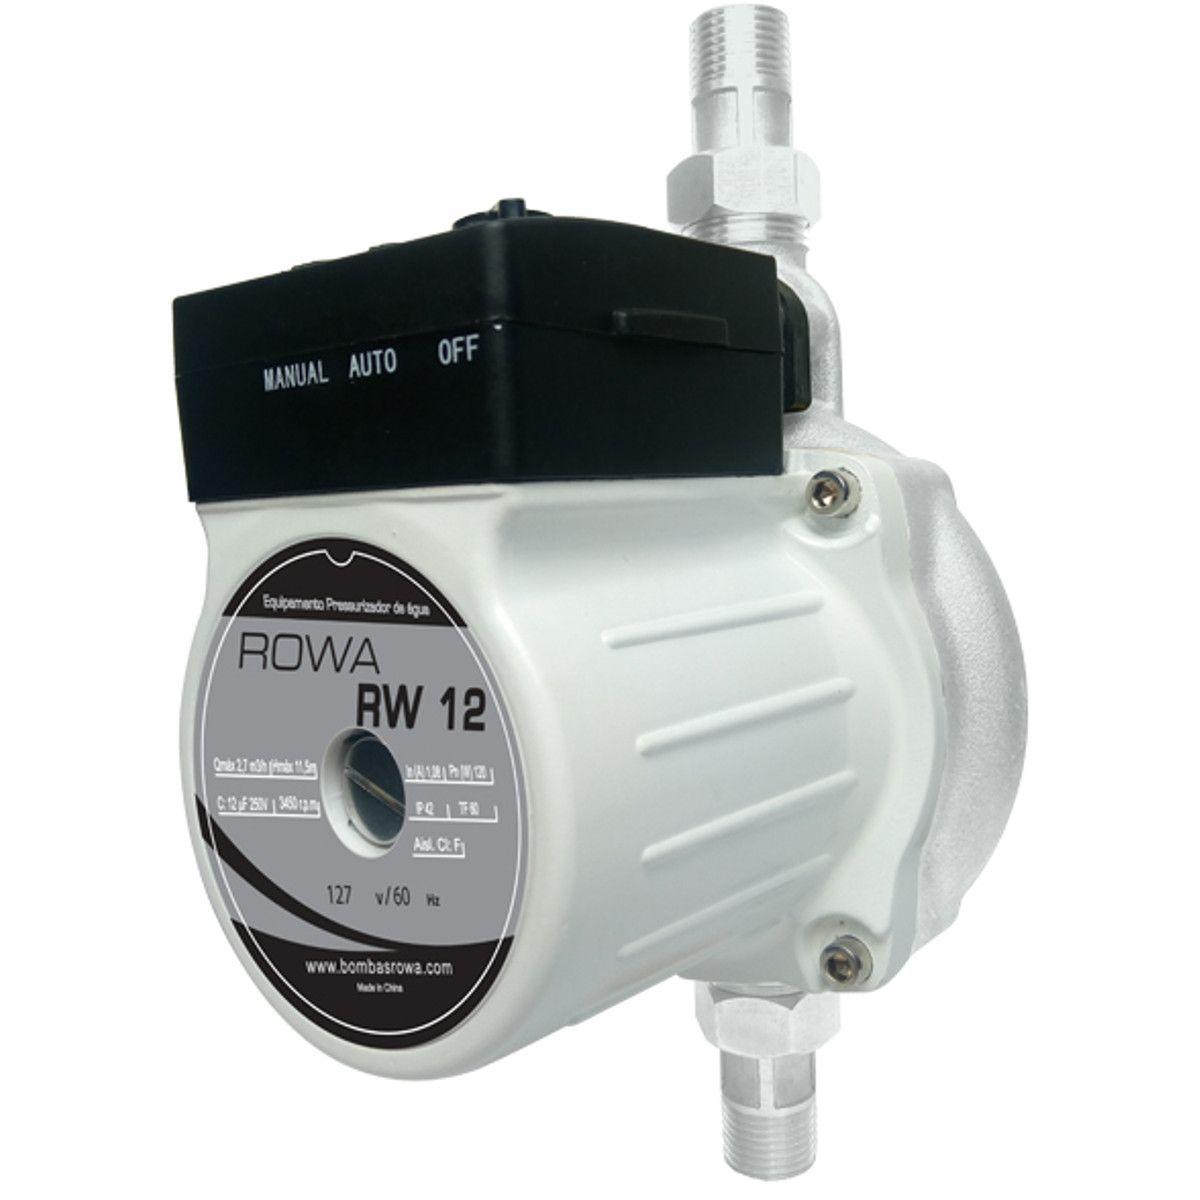 Pressurizador Rowa Mini Rw12 150W Monofásico